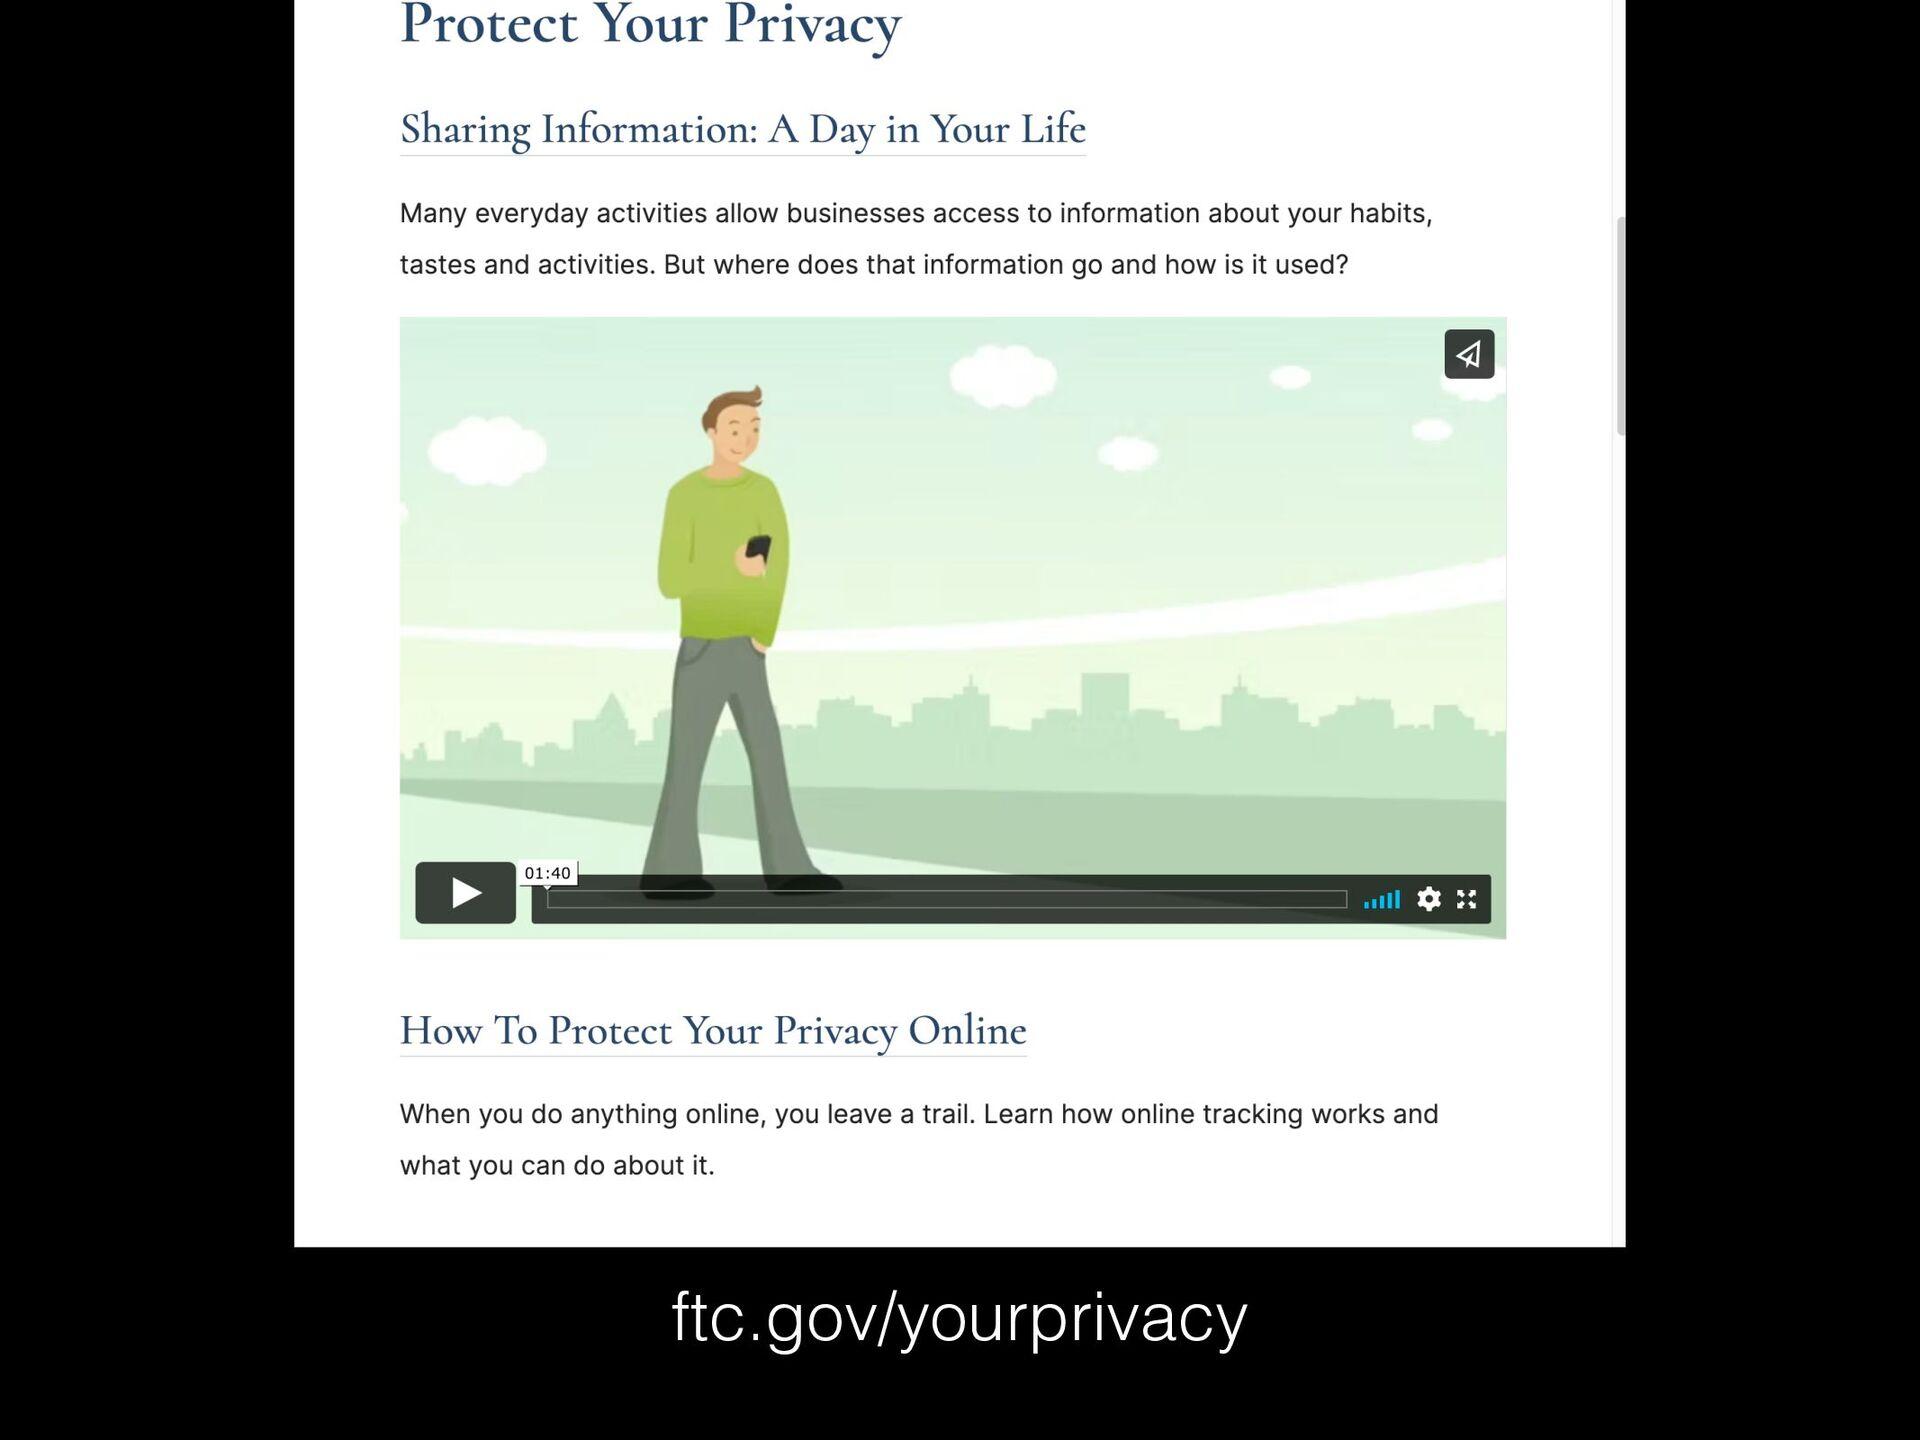 ssd.eff.org